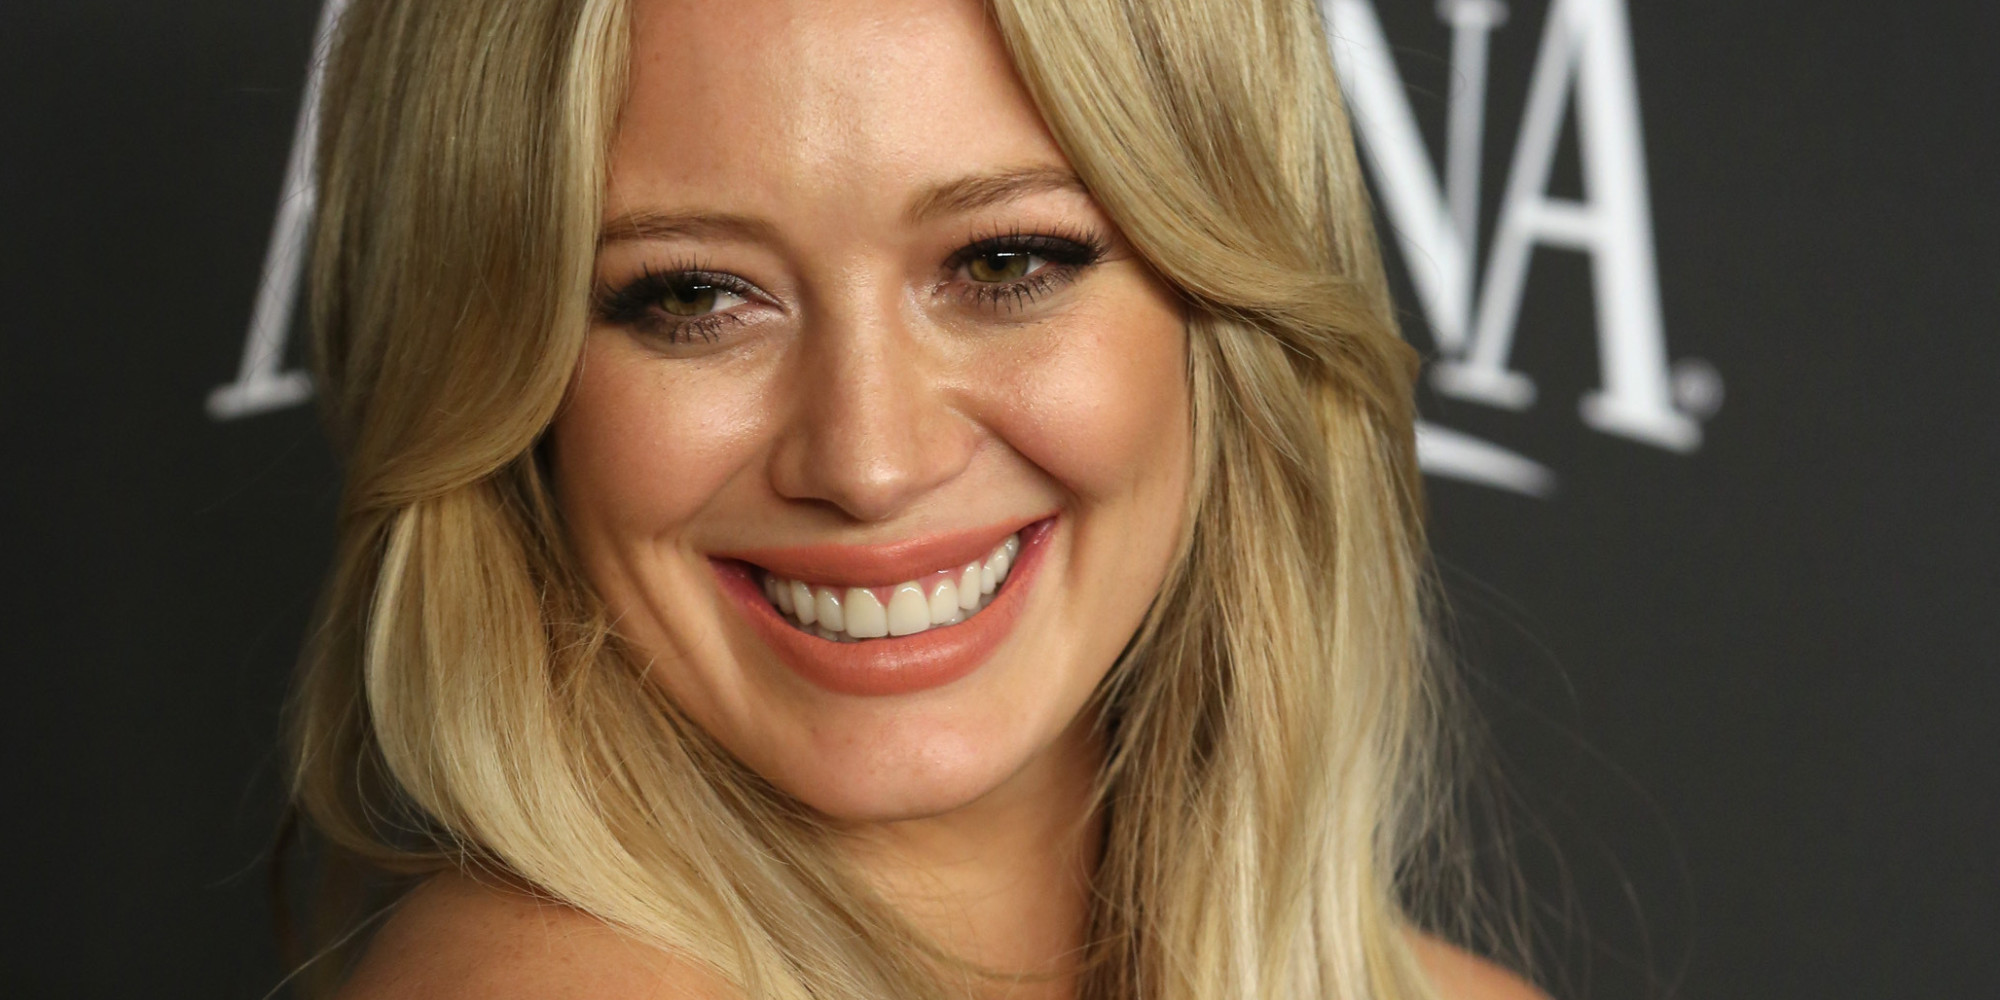 Pin Hilary Duff Facebo... Hilary Duff Facebook